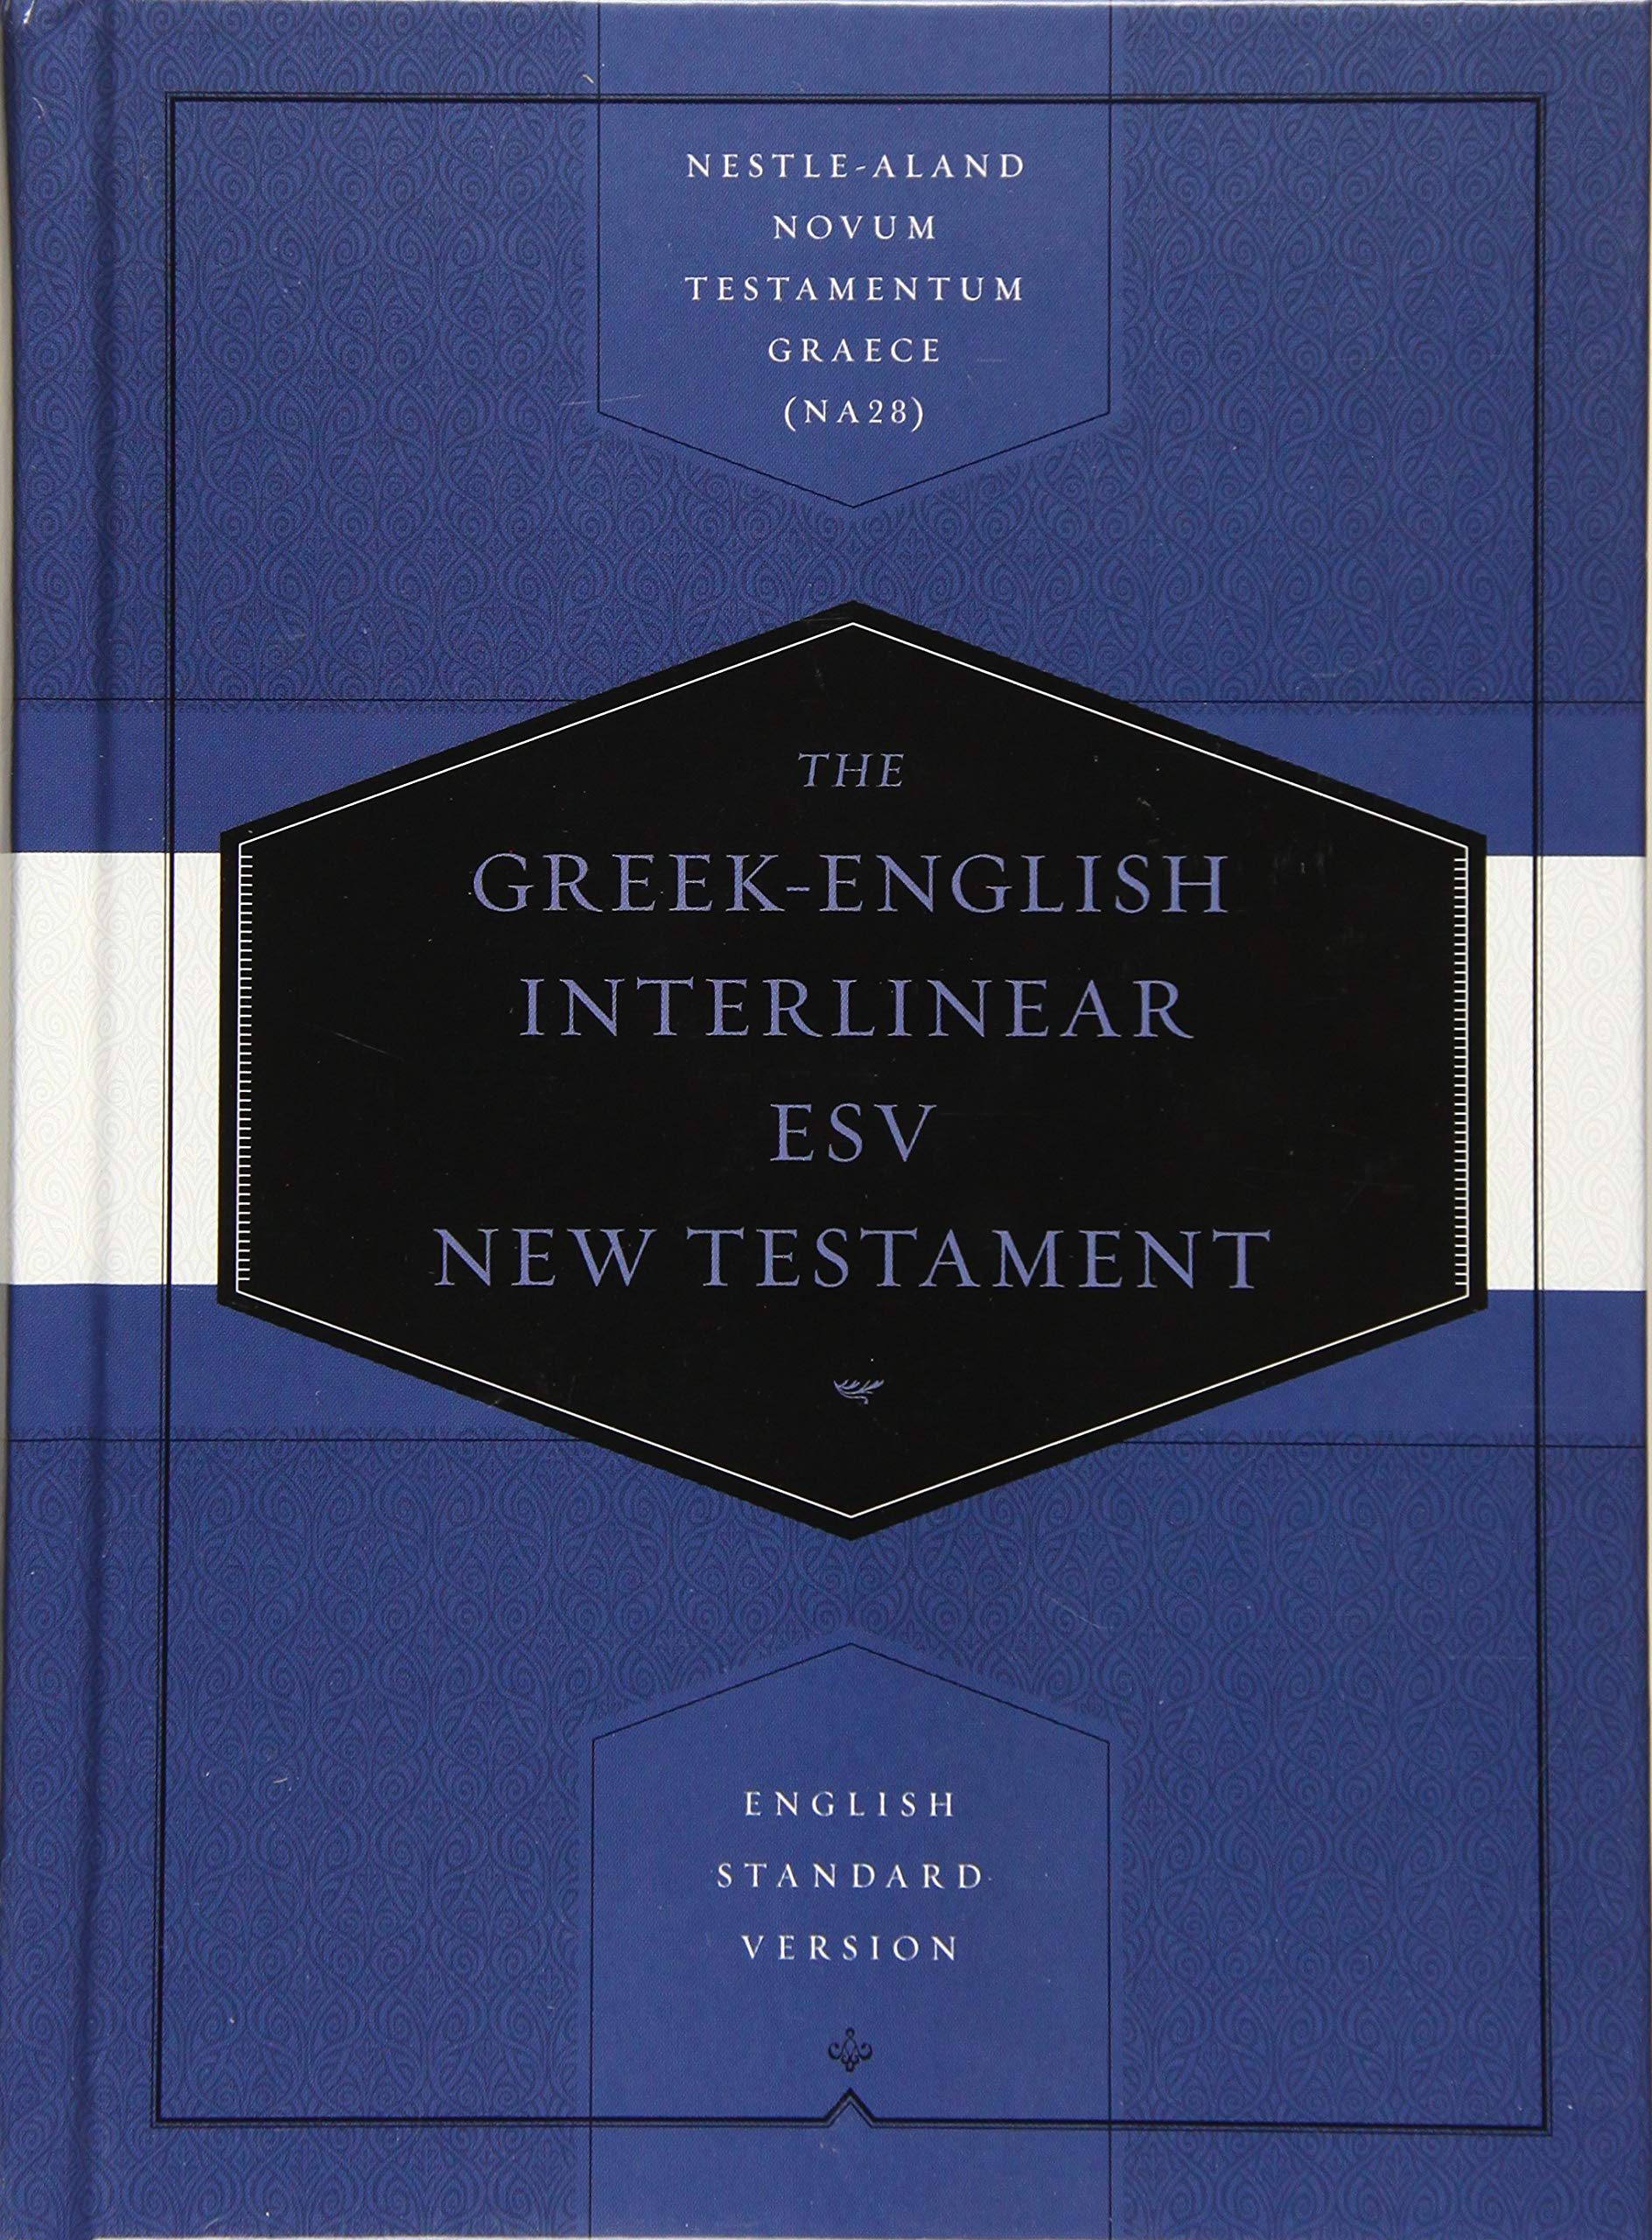 Greek English Interlinear ESV New Testament  Nestle Aland Novum Testamentum Graece And English Standard Version  ESV   Nestle Aland Novum Testamentum Graece  NA28  And English Standard Version  ESV